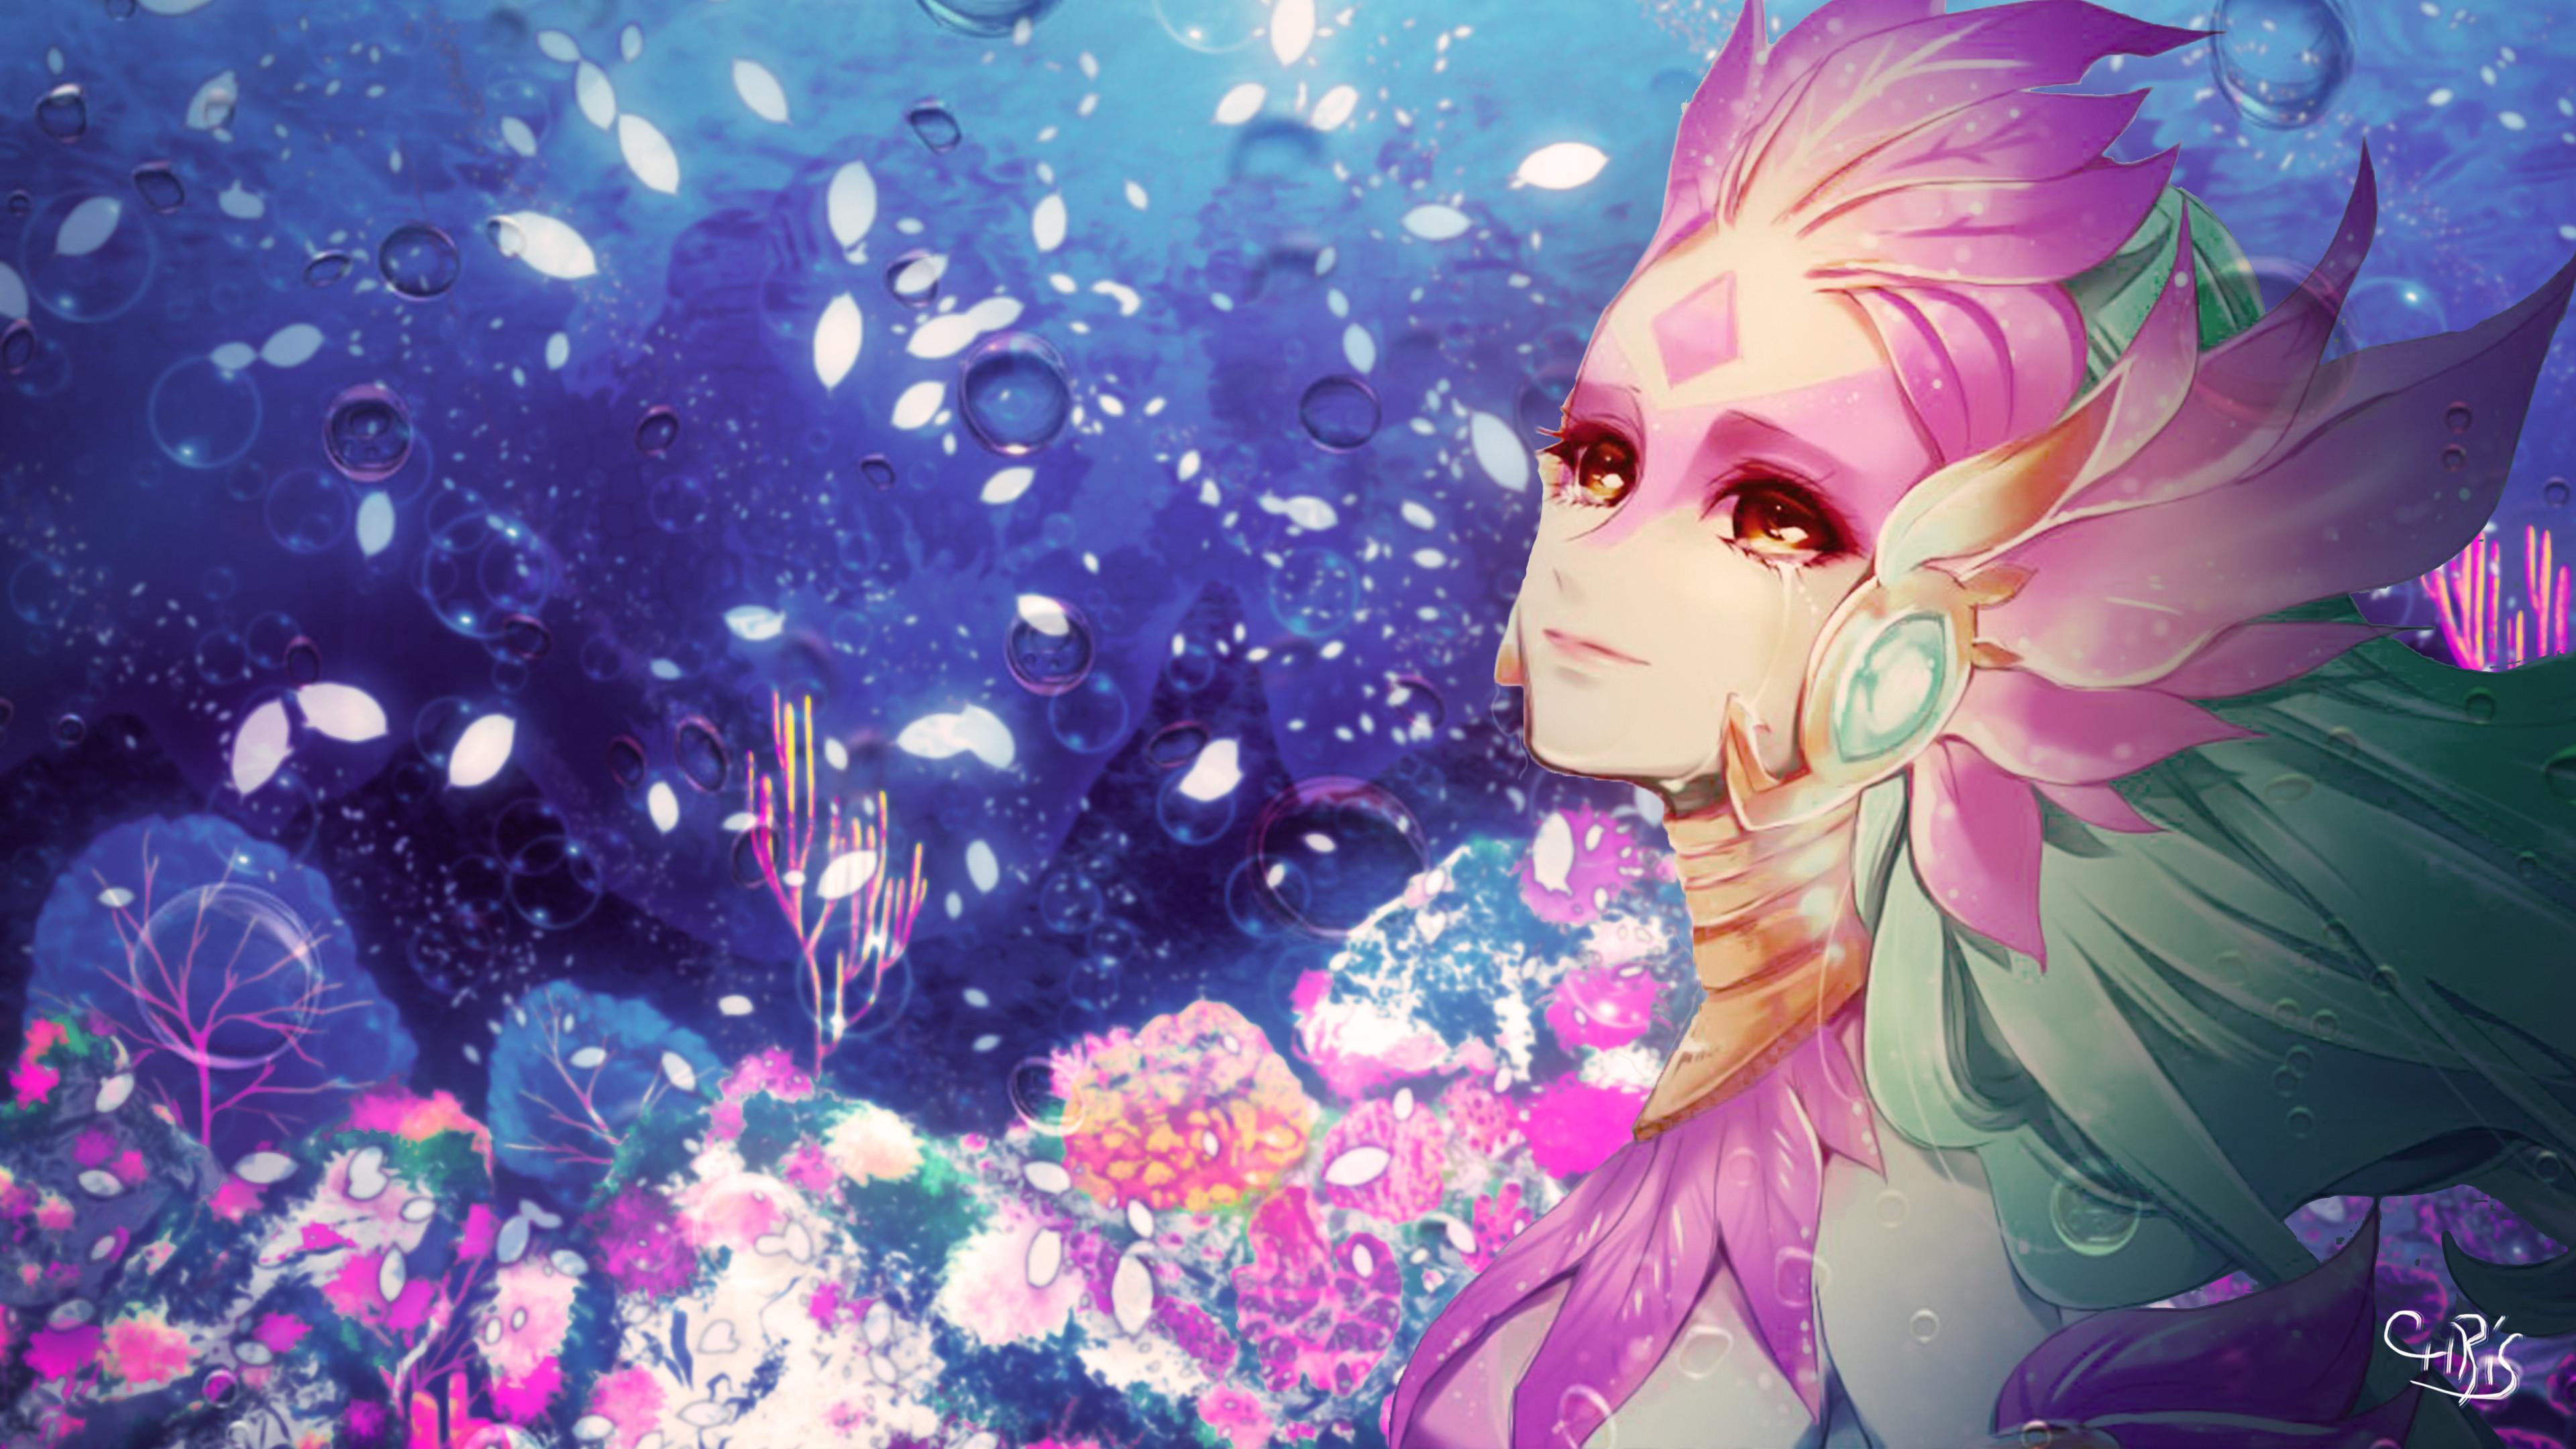 Res: 3840x2160, River Spirit Nami wallpaper